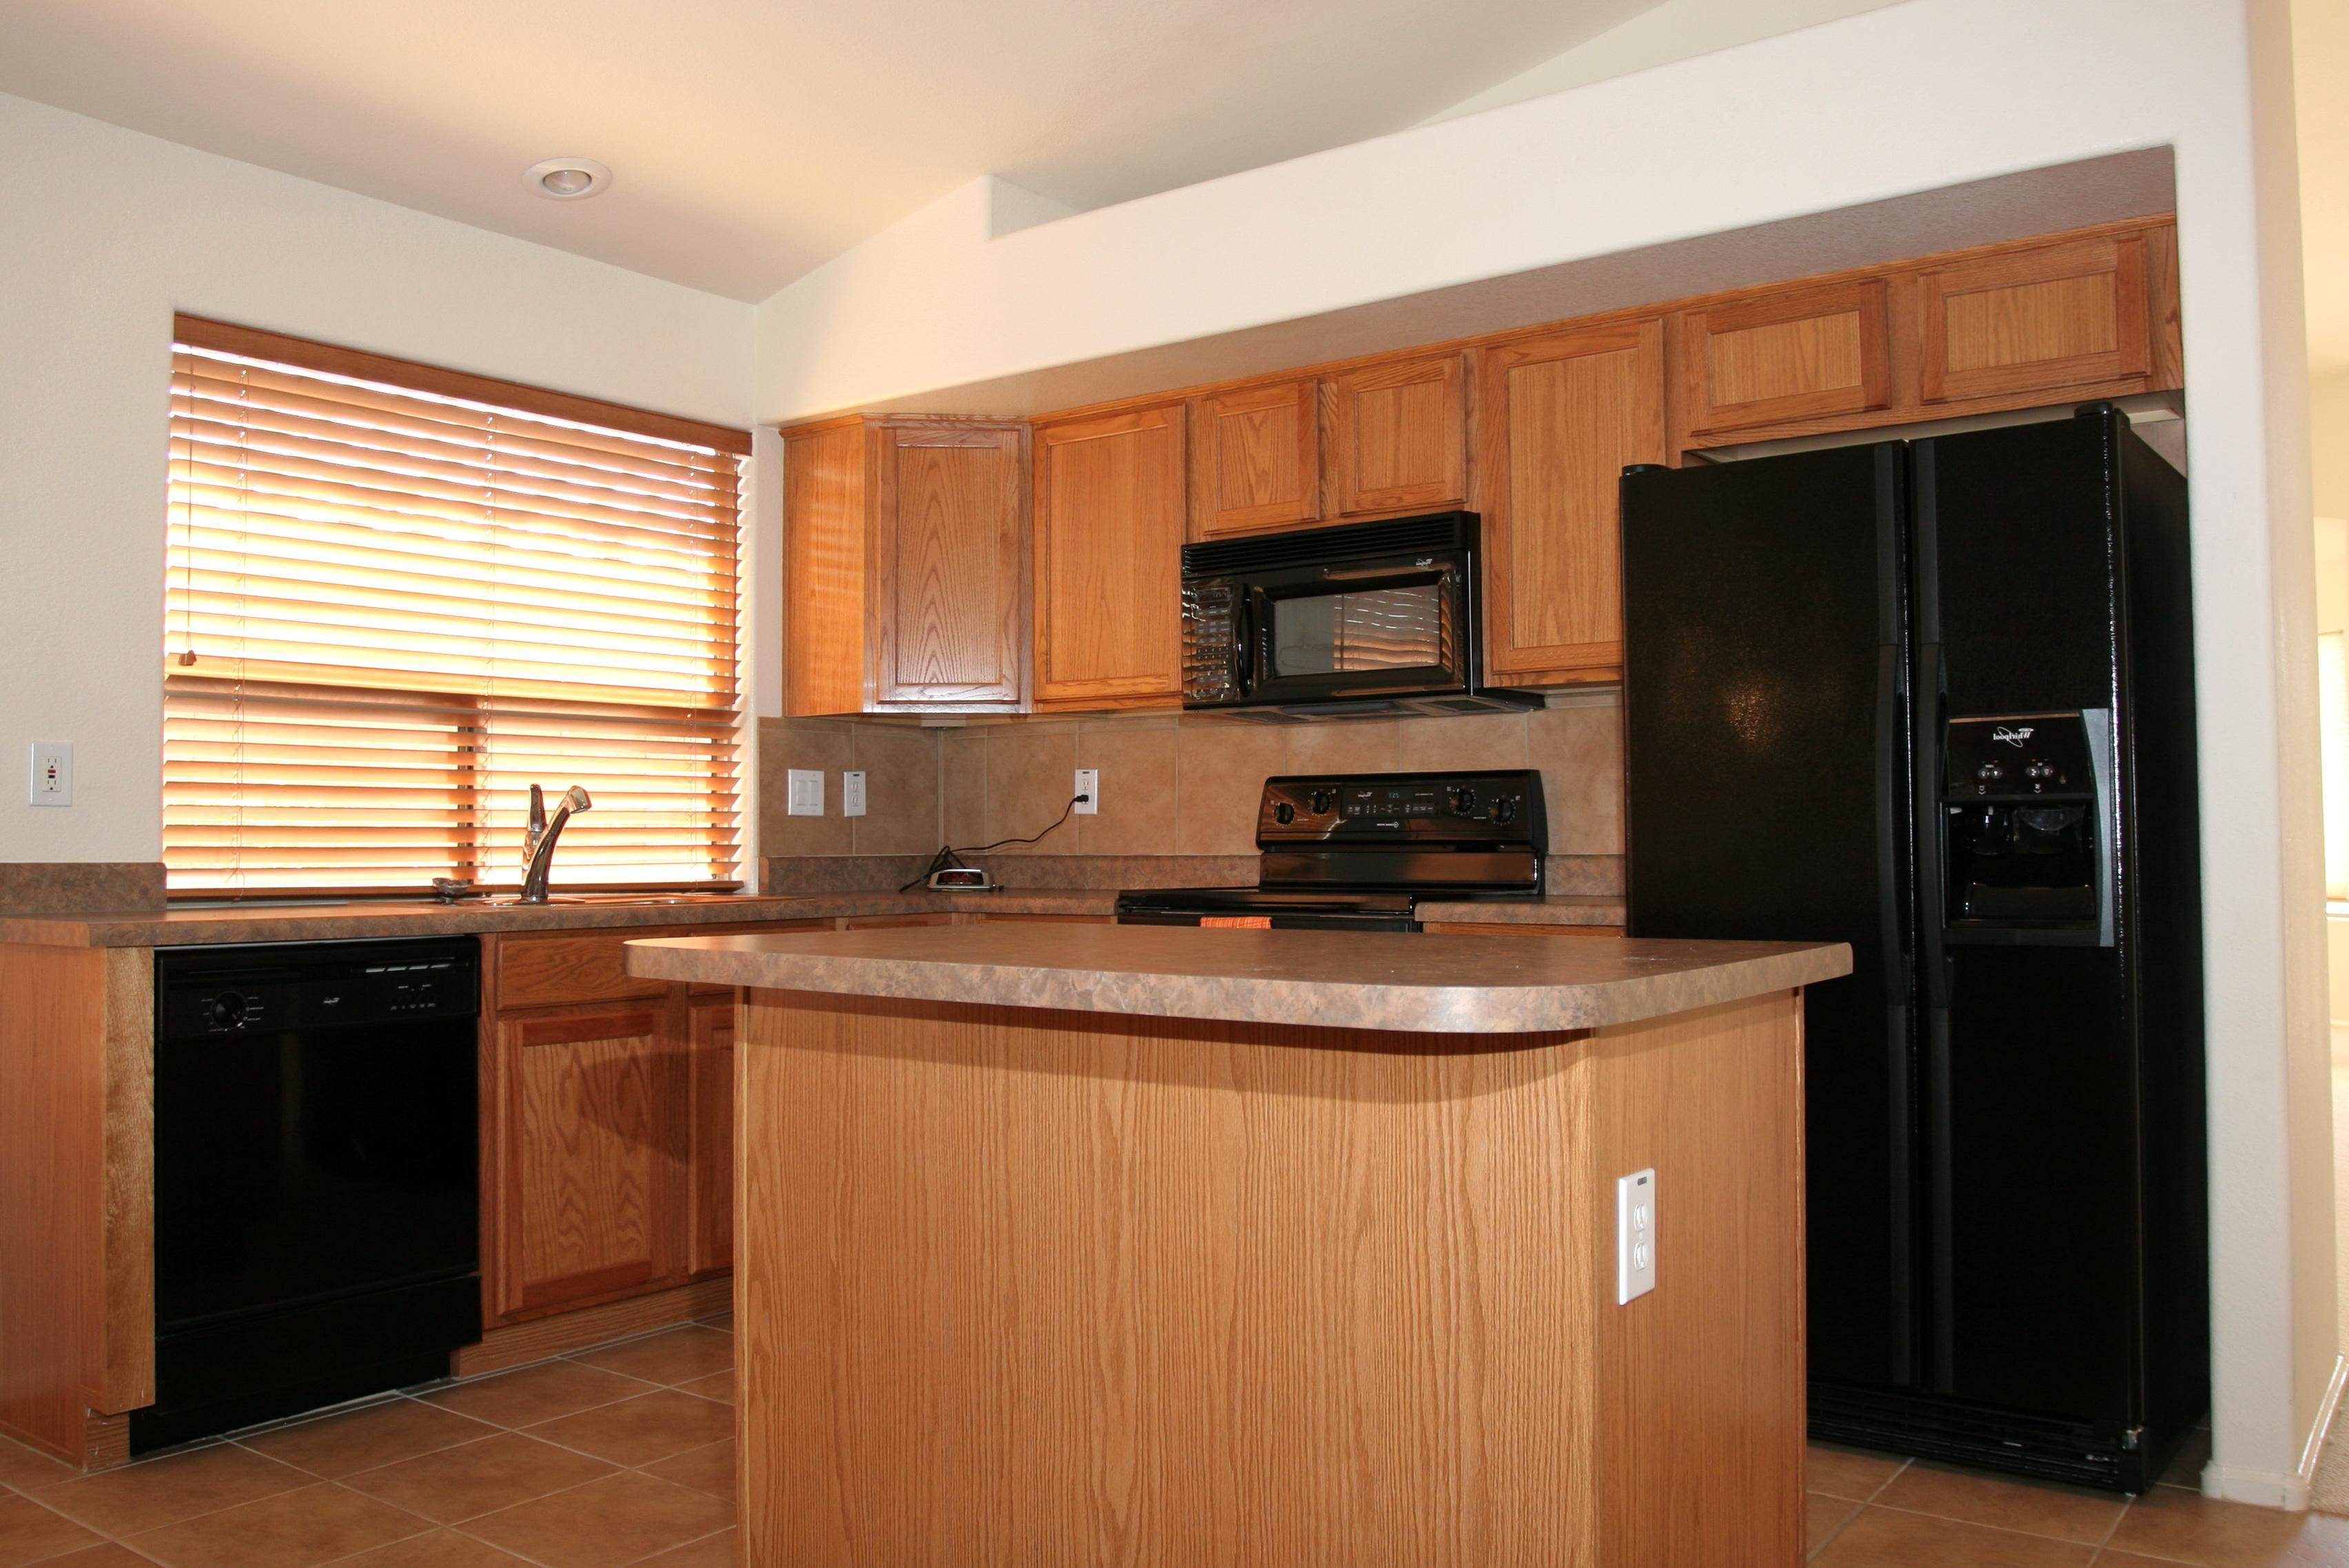 Oak Kitchen Cabinets With Black Appliances